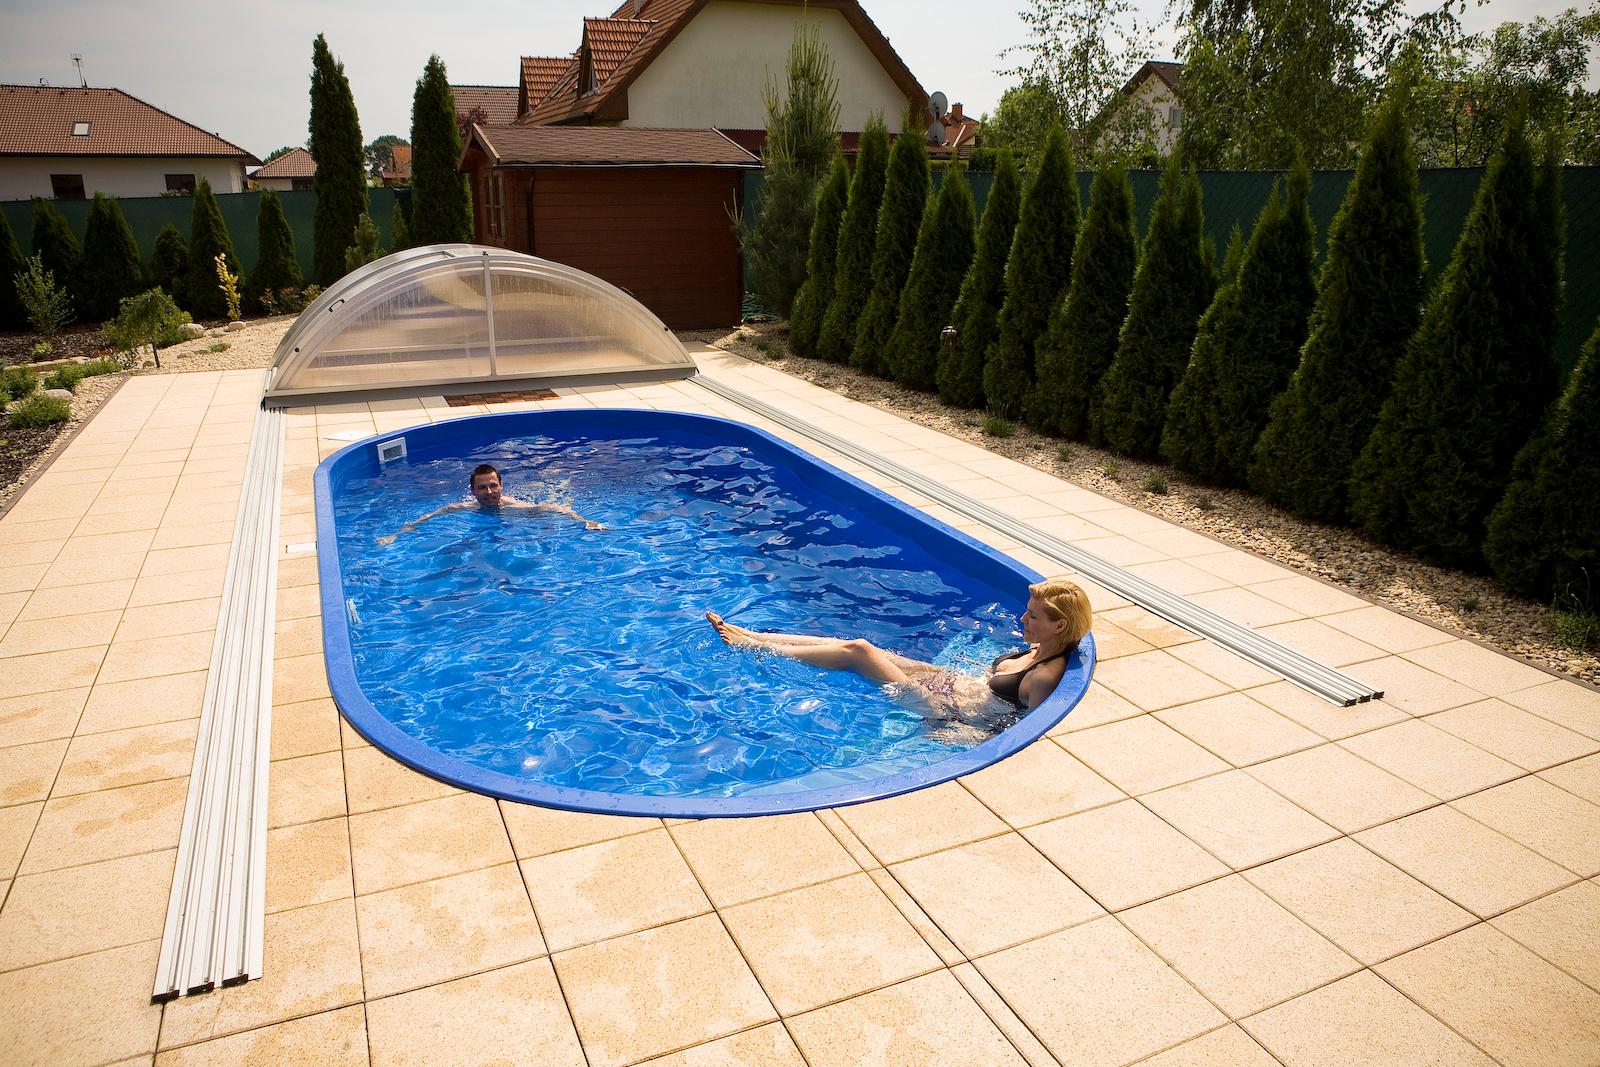 GFK-Pool   Pool   Pinterest